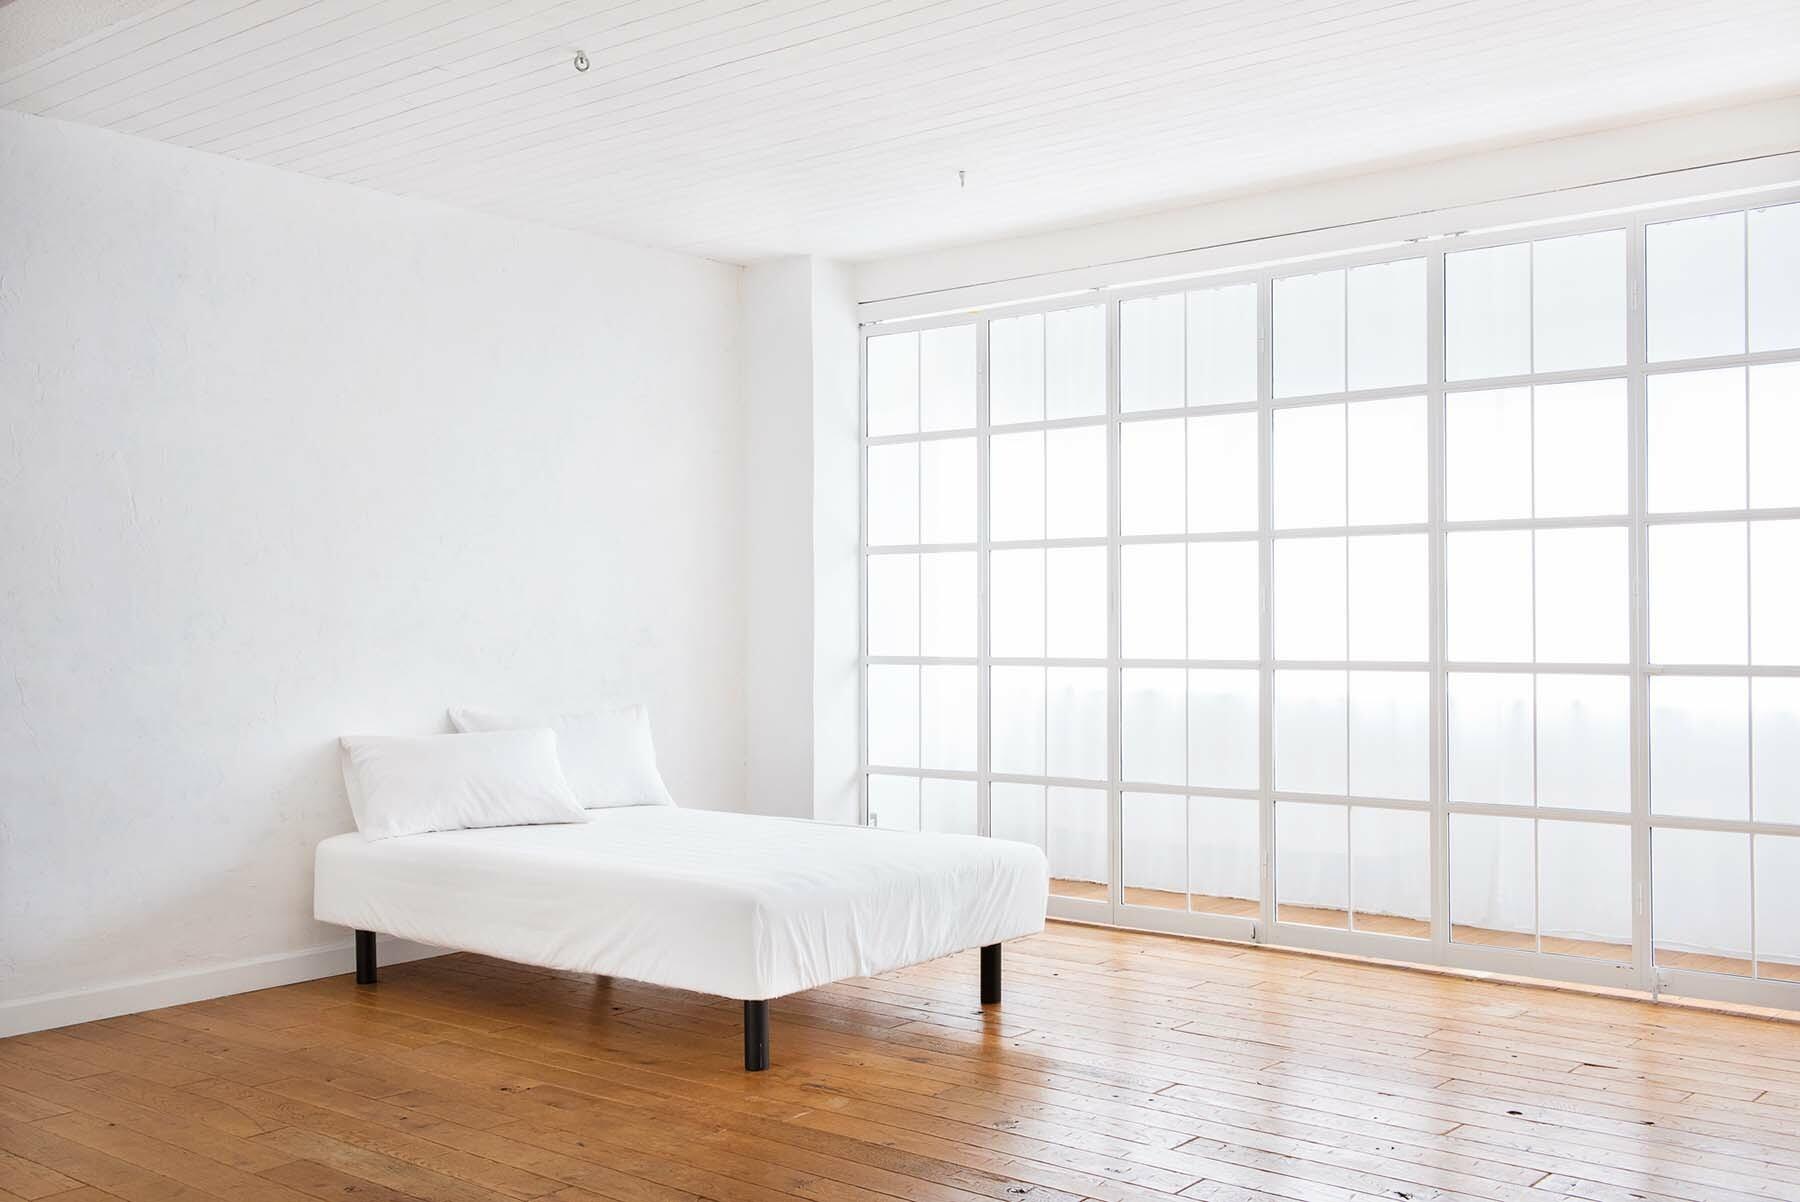 StudioBRICK 3F (スタジオブリック八丁堀3F)奥行きのある窓ぬけ